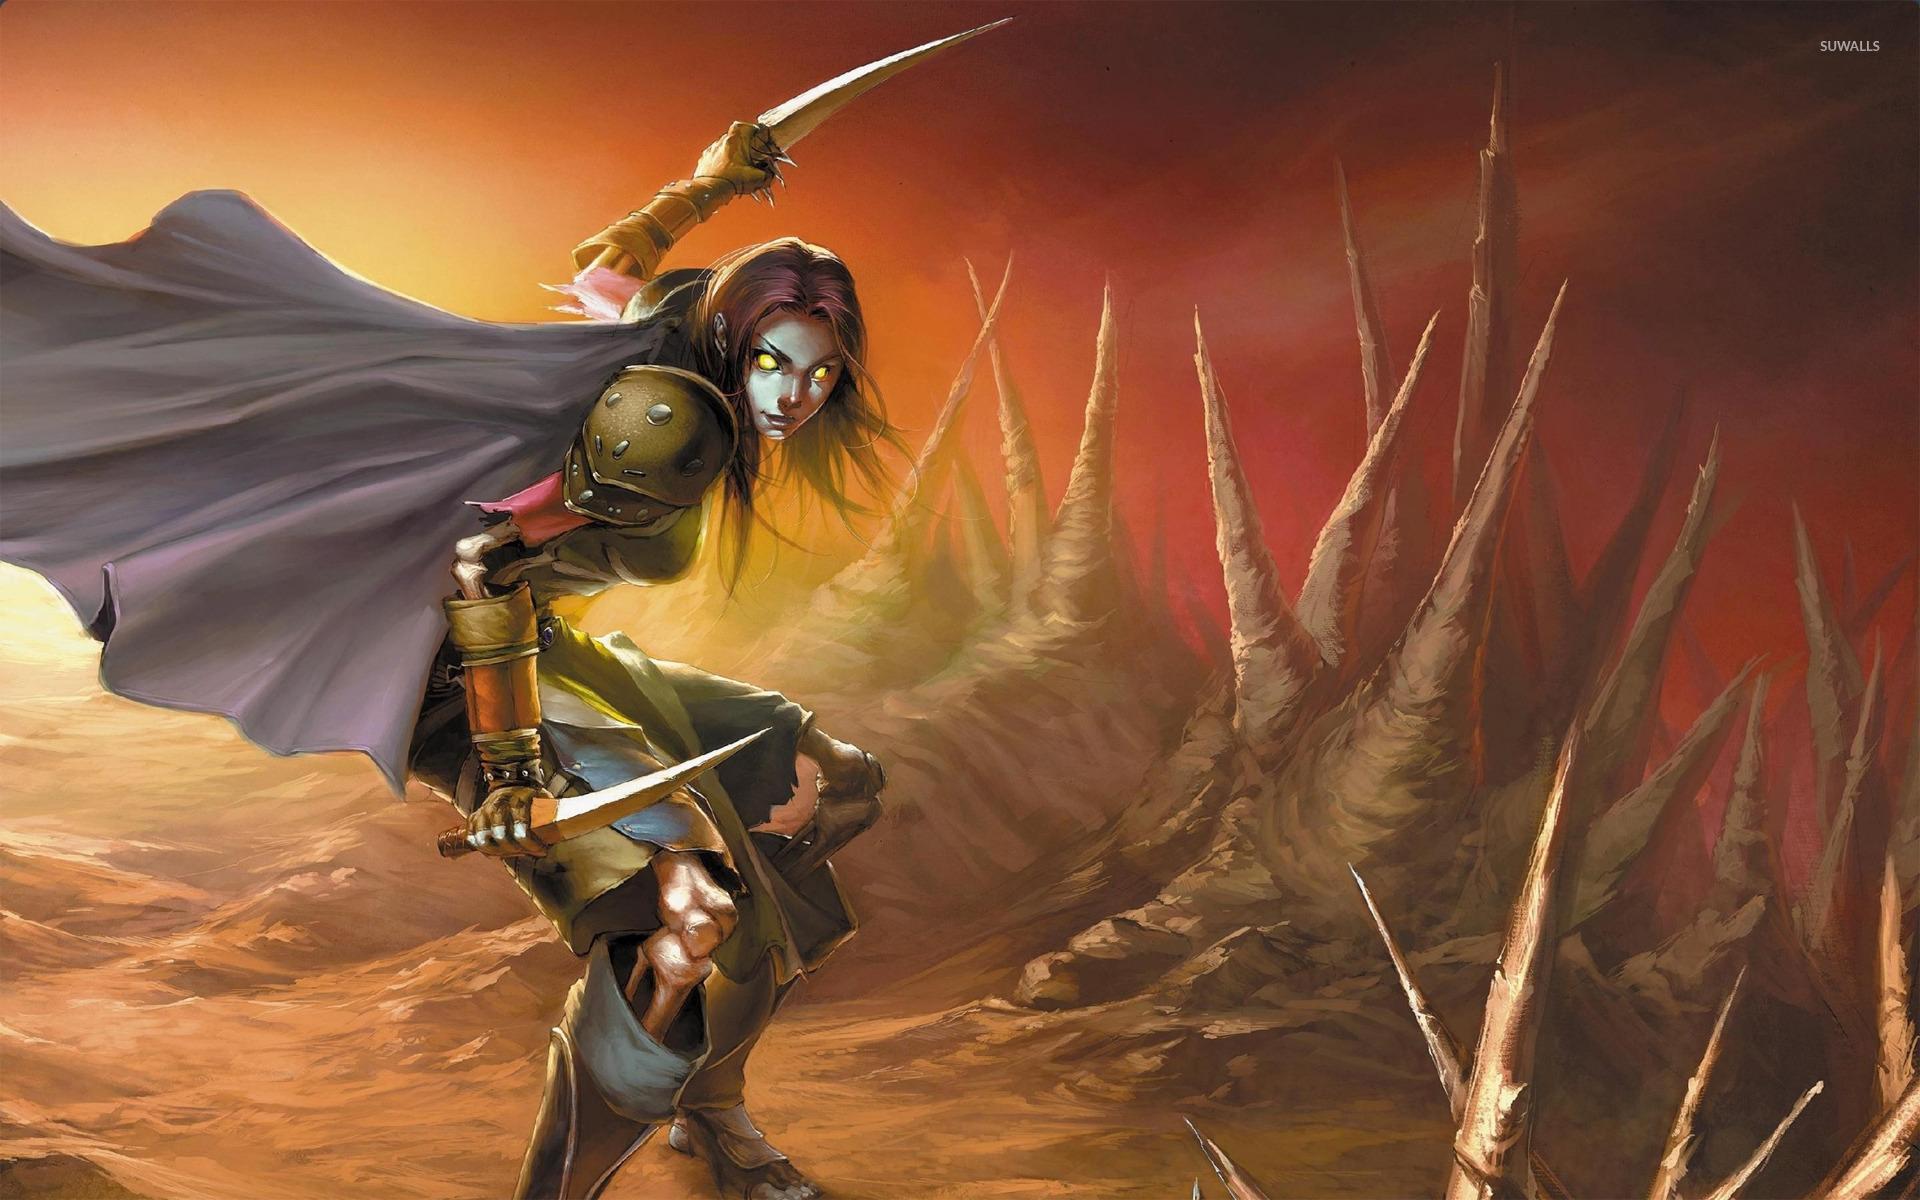 World Of Warcraft Cataclysm 10 Wallpaper Game Wallpapers 18306